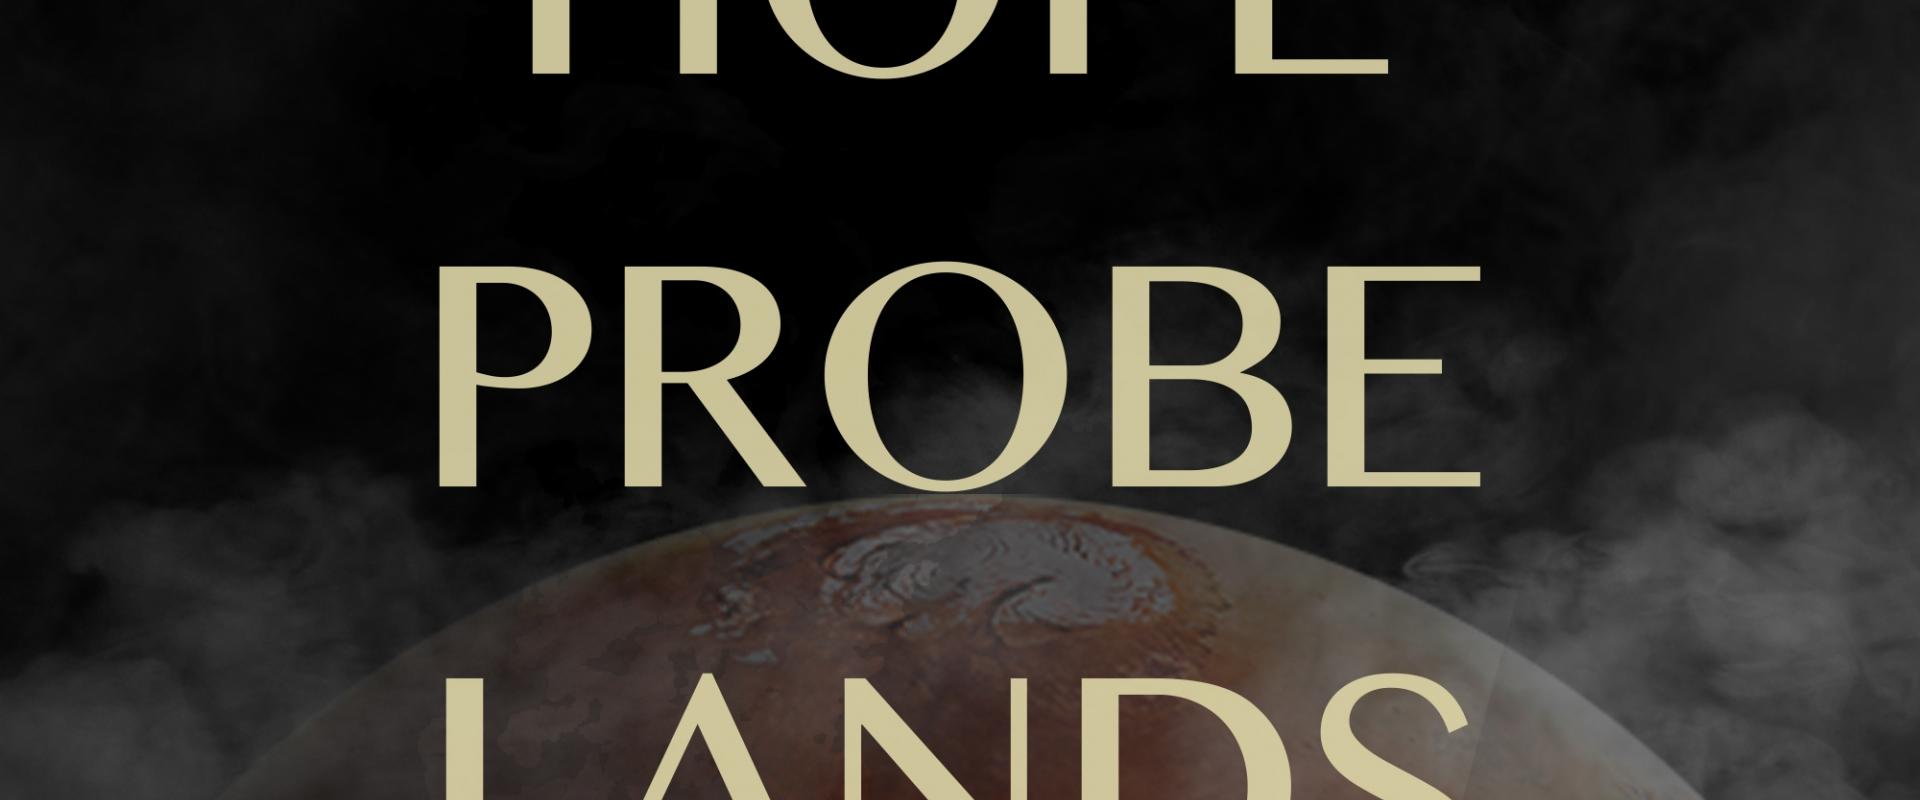 Hope Probe Mission to Mars